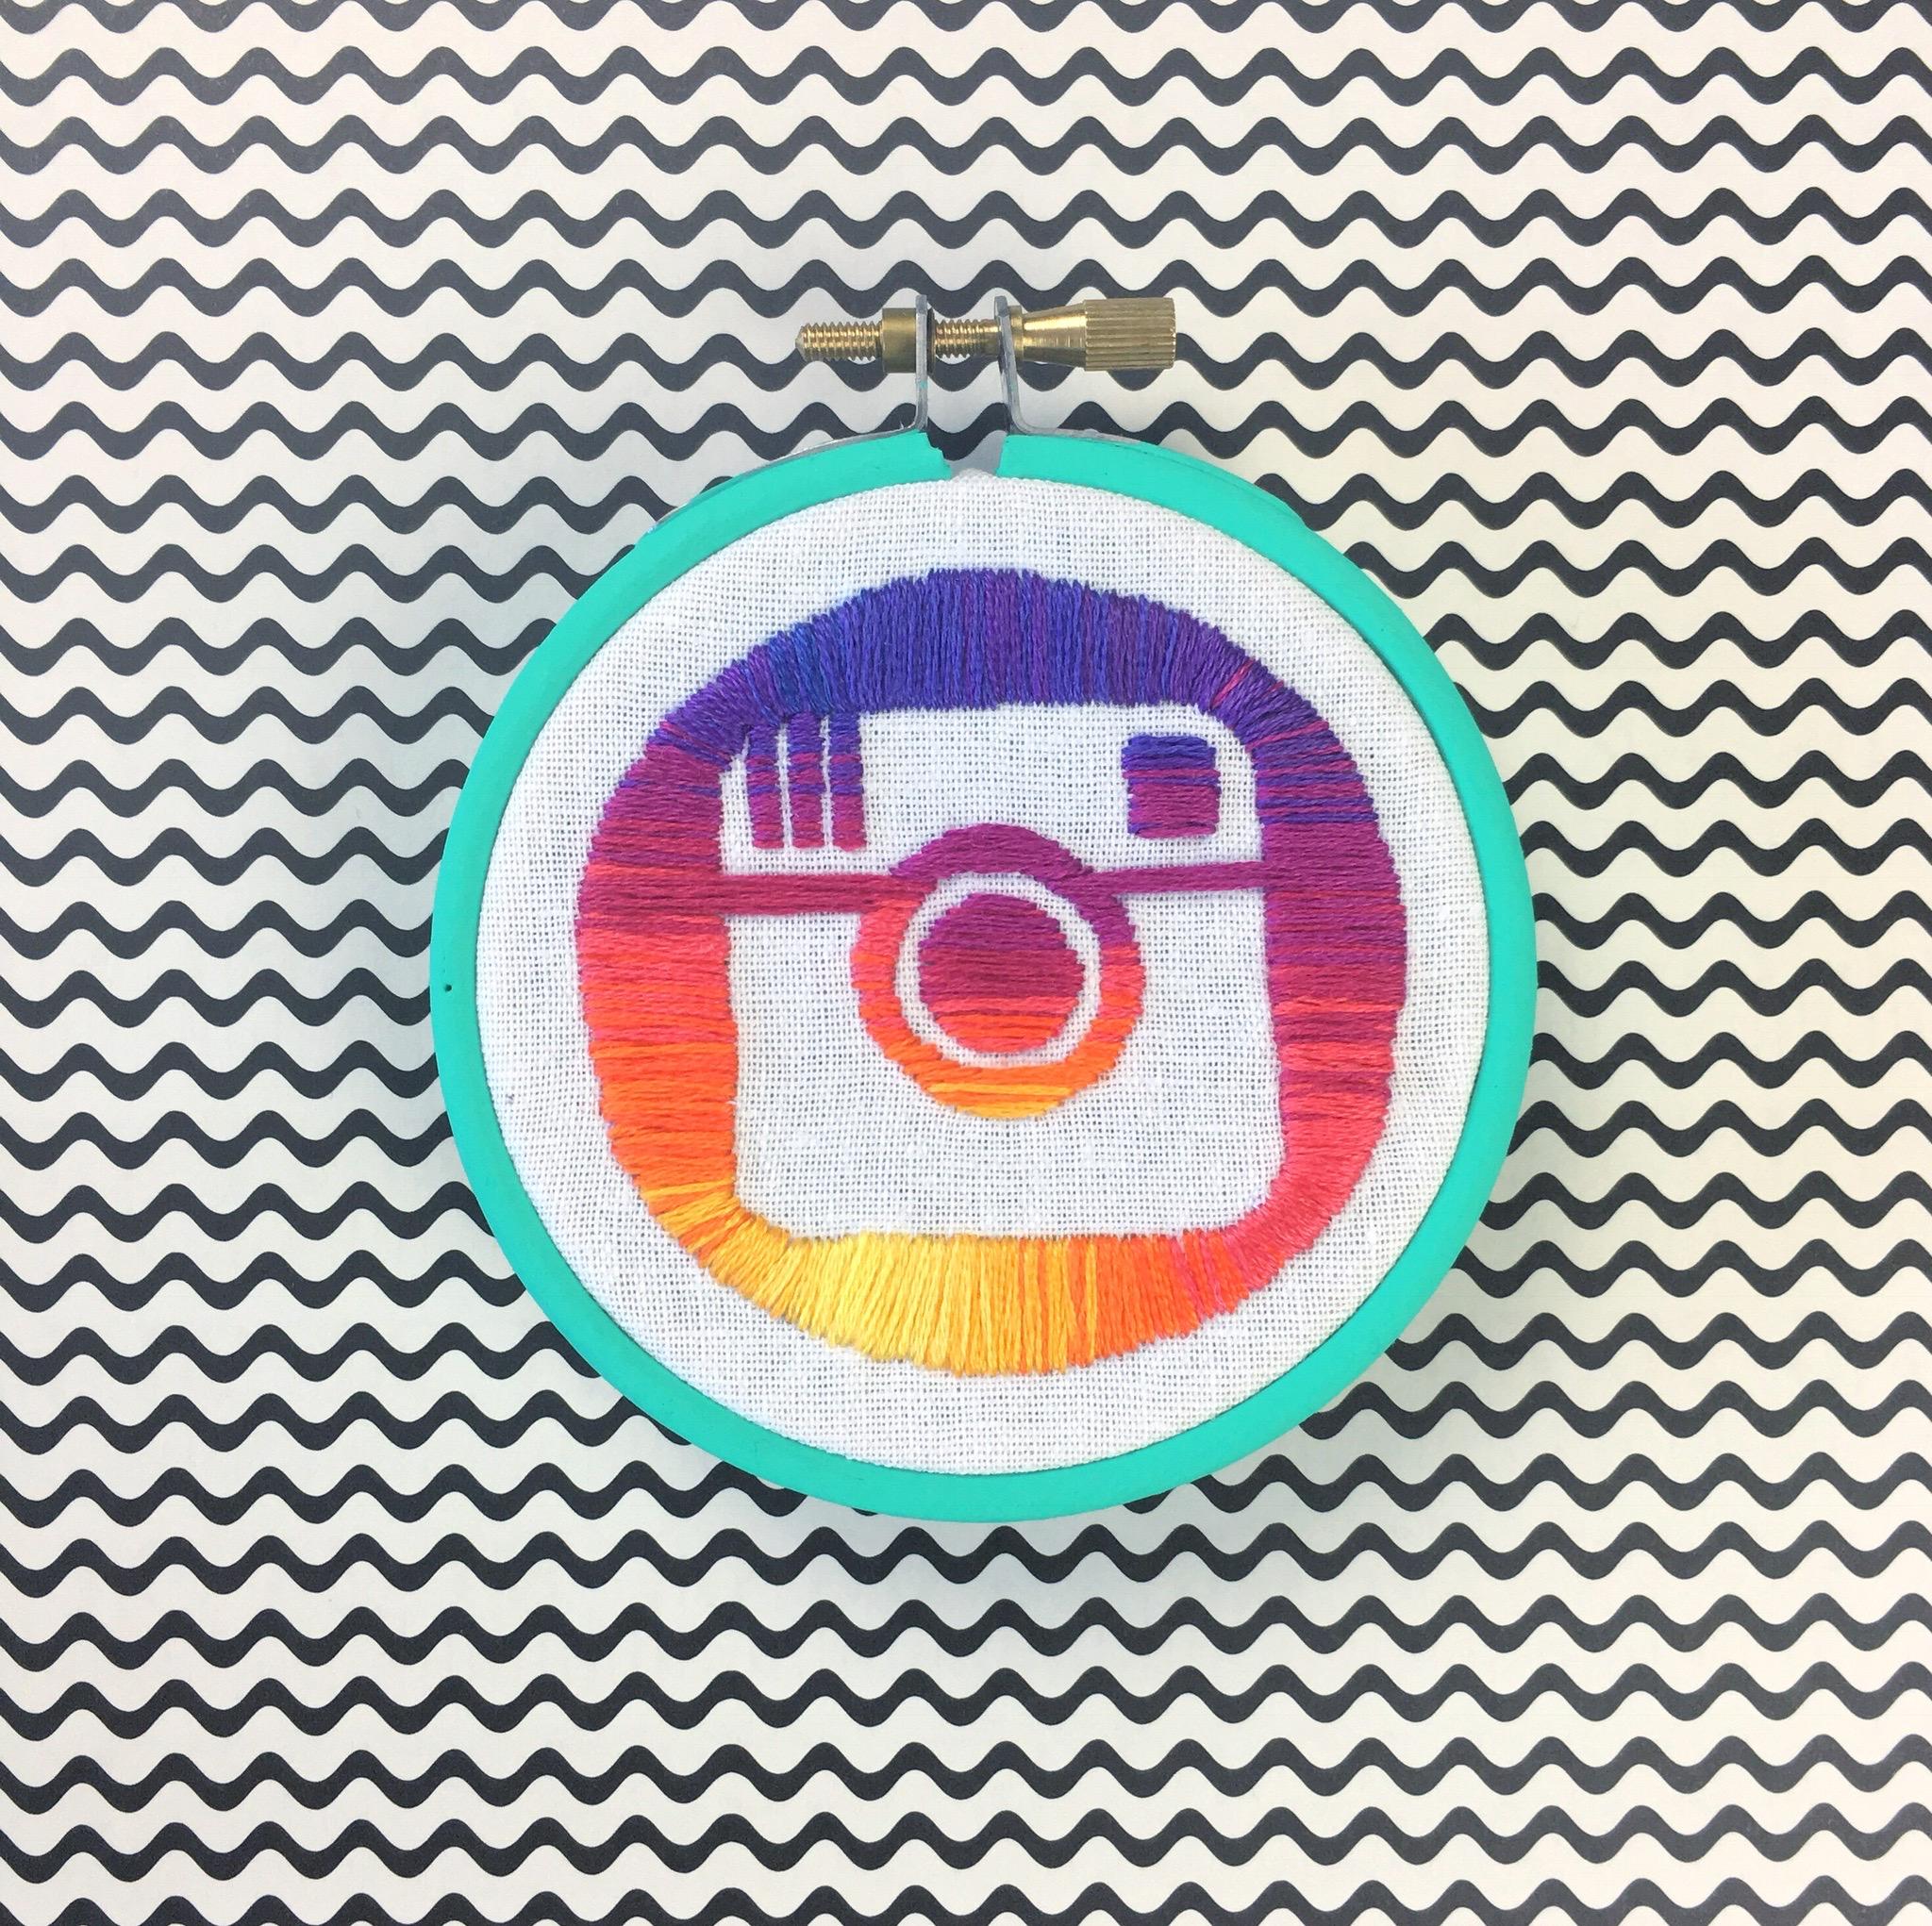 Instagram stitched logo | Hello! Hooray!